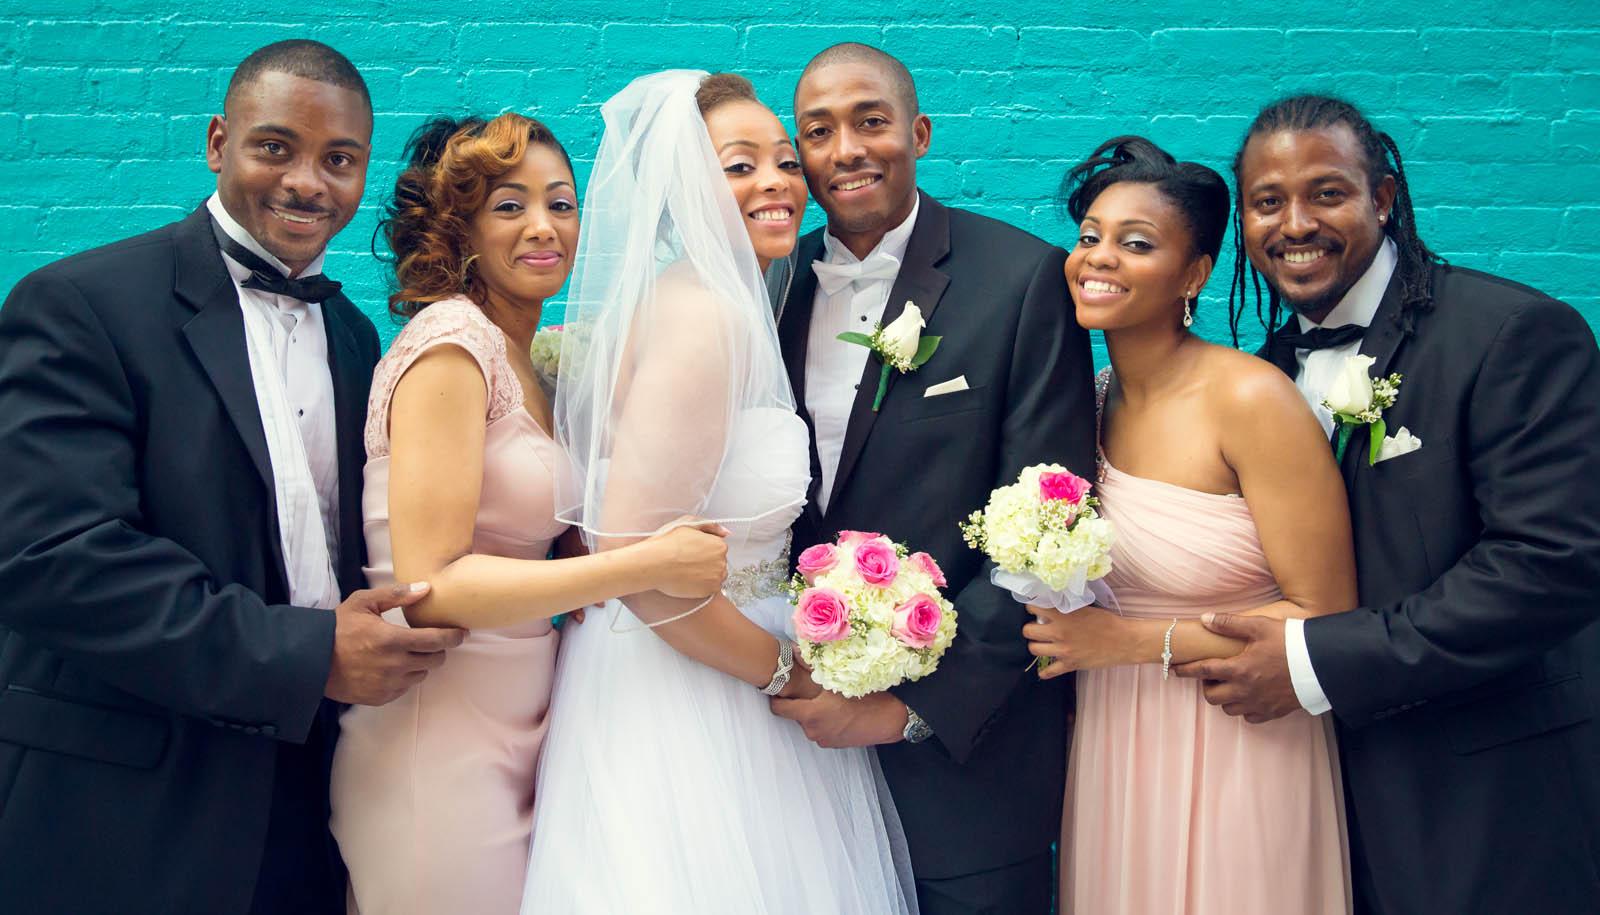 Malik_and_Shanika_Wedding_Ernestosue-9186-Edit.jpg